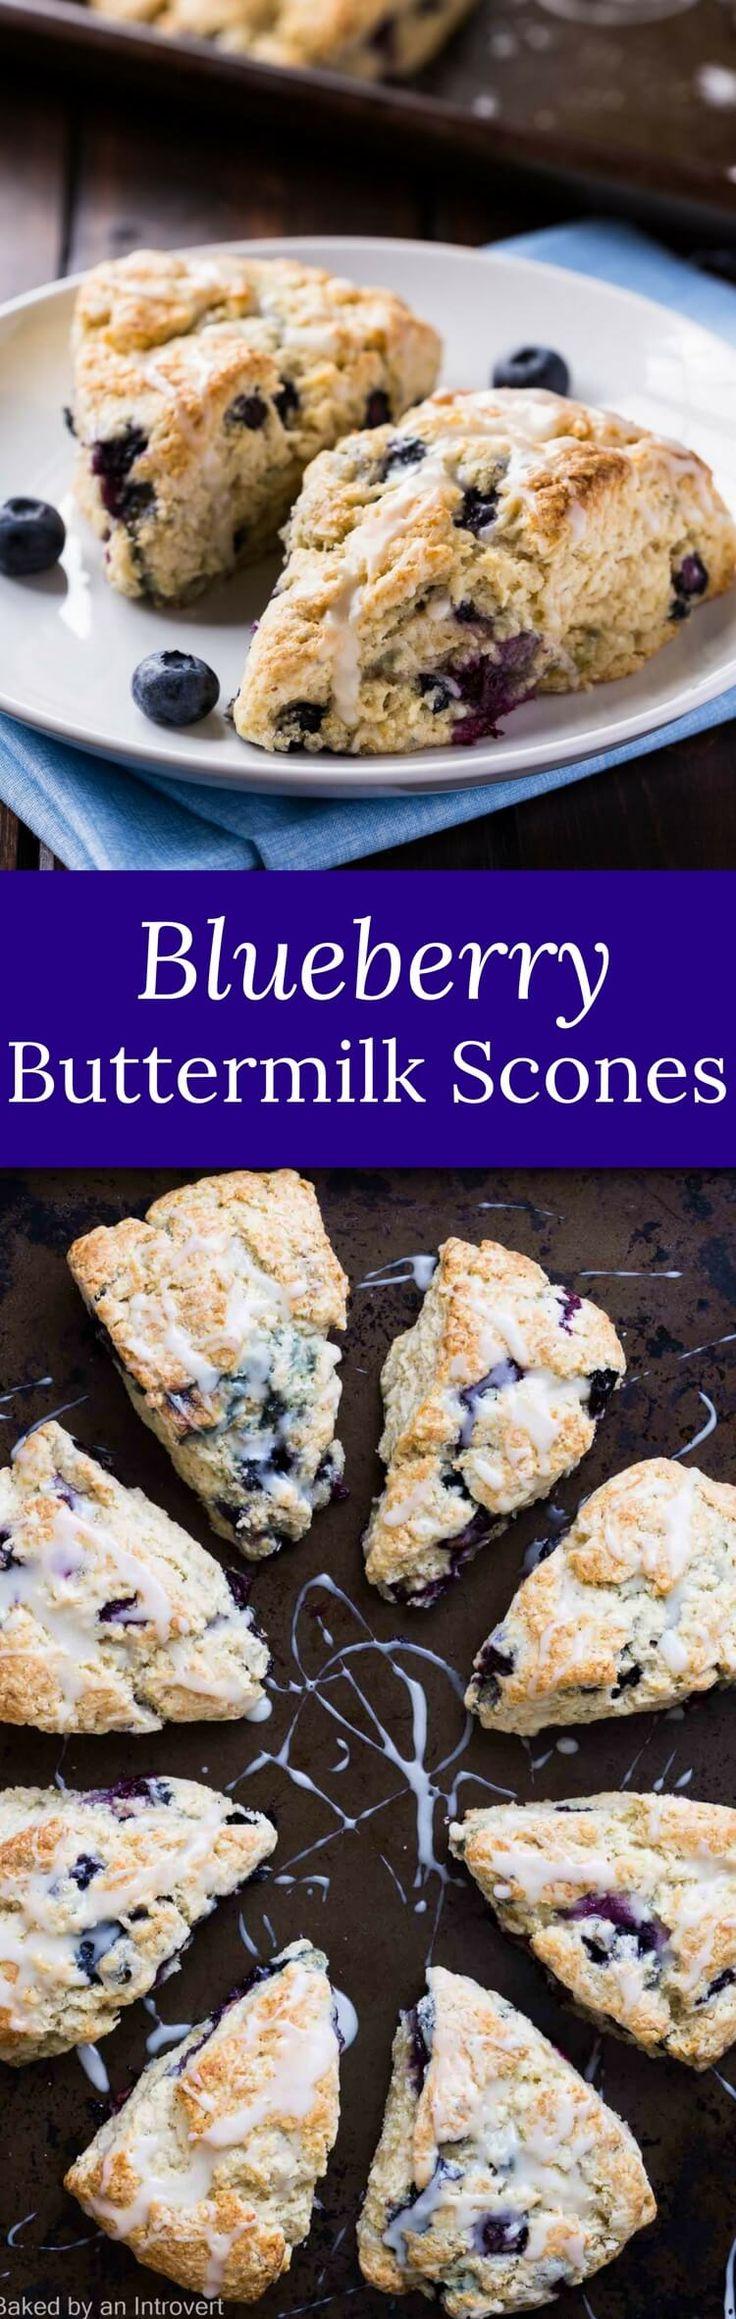 Blueberry Buttermilk Scones | Breakfast | Brunch | Recipe via @introvertbaker